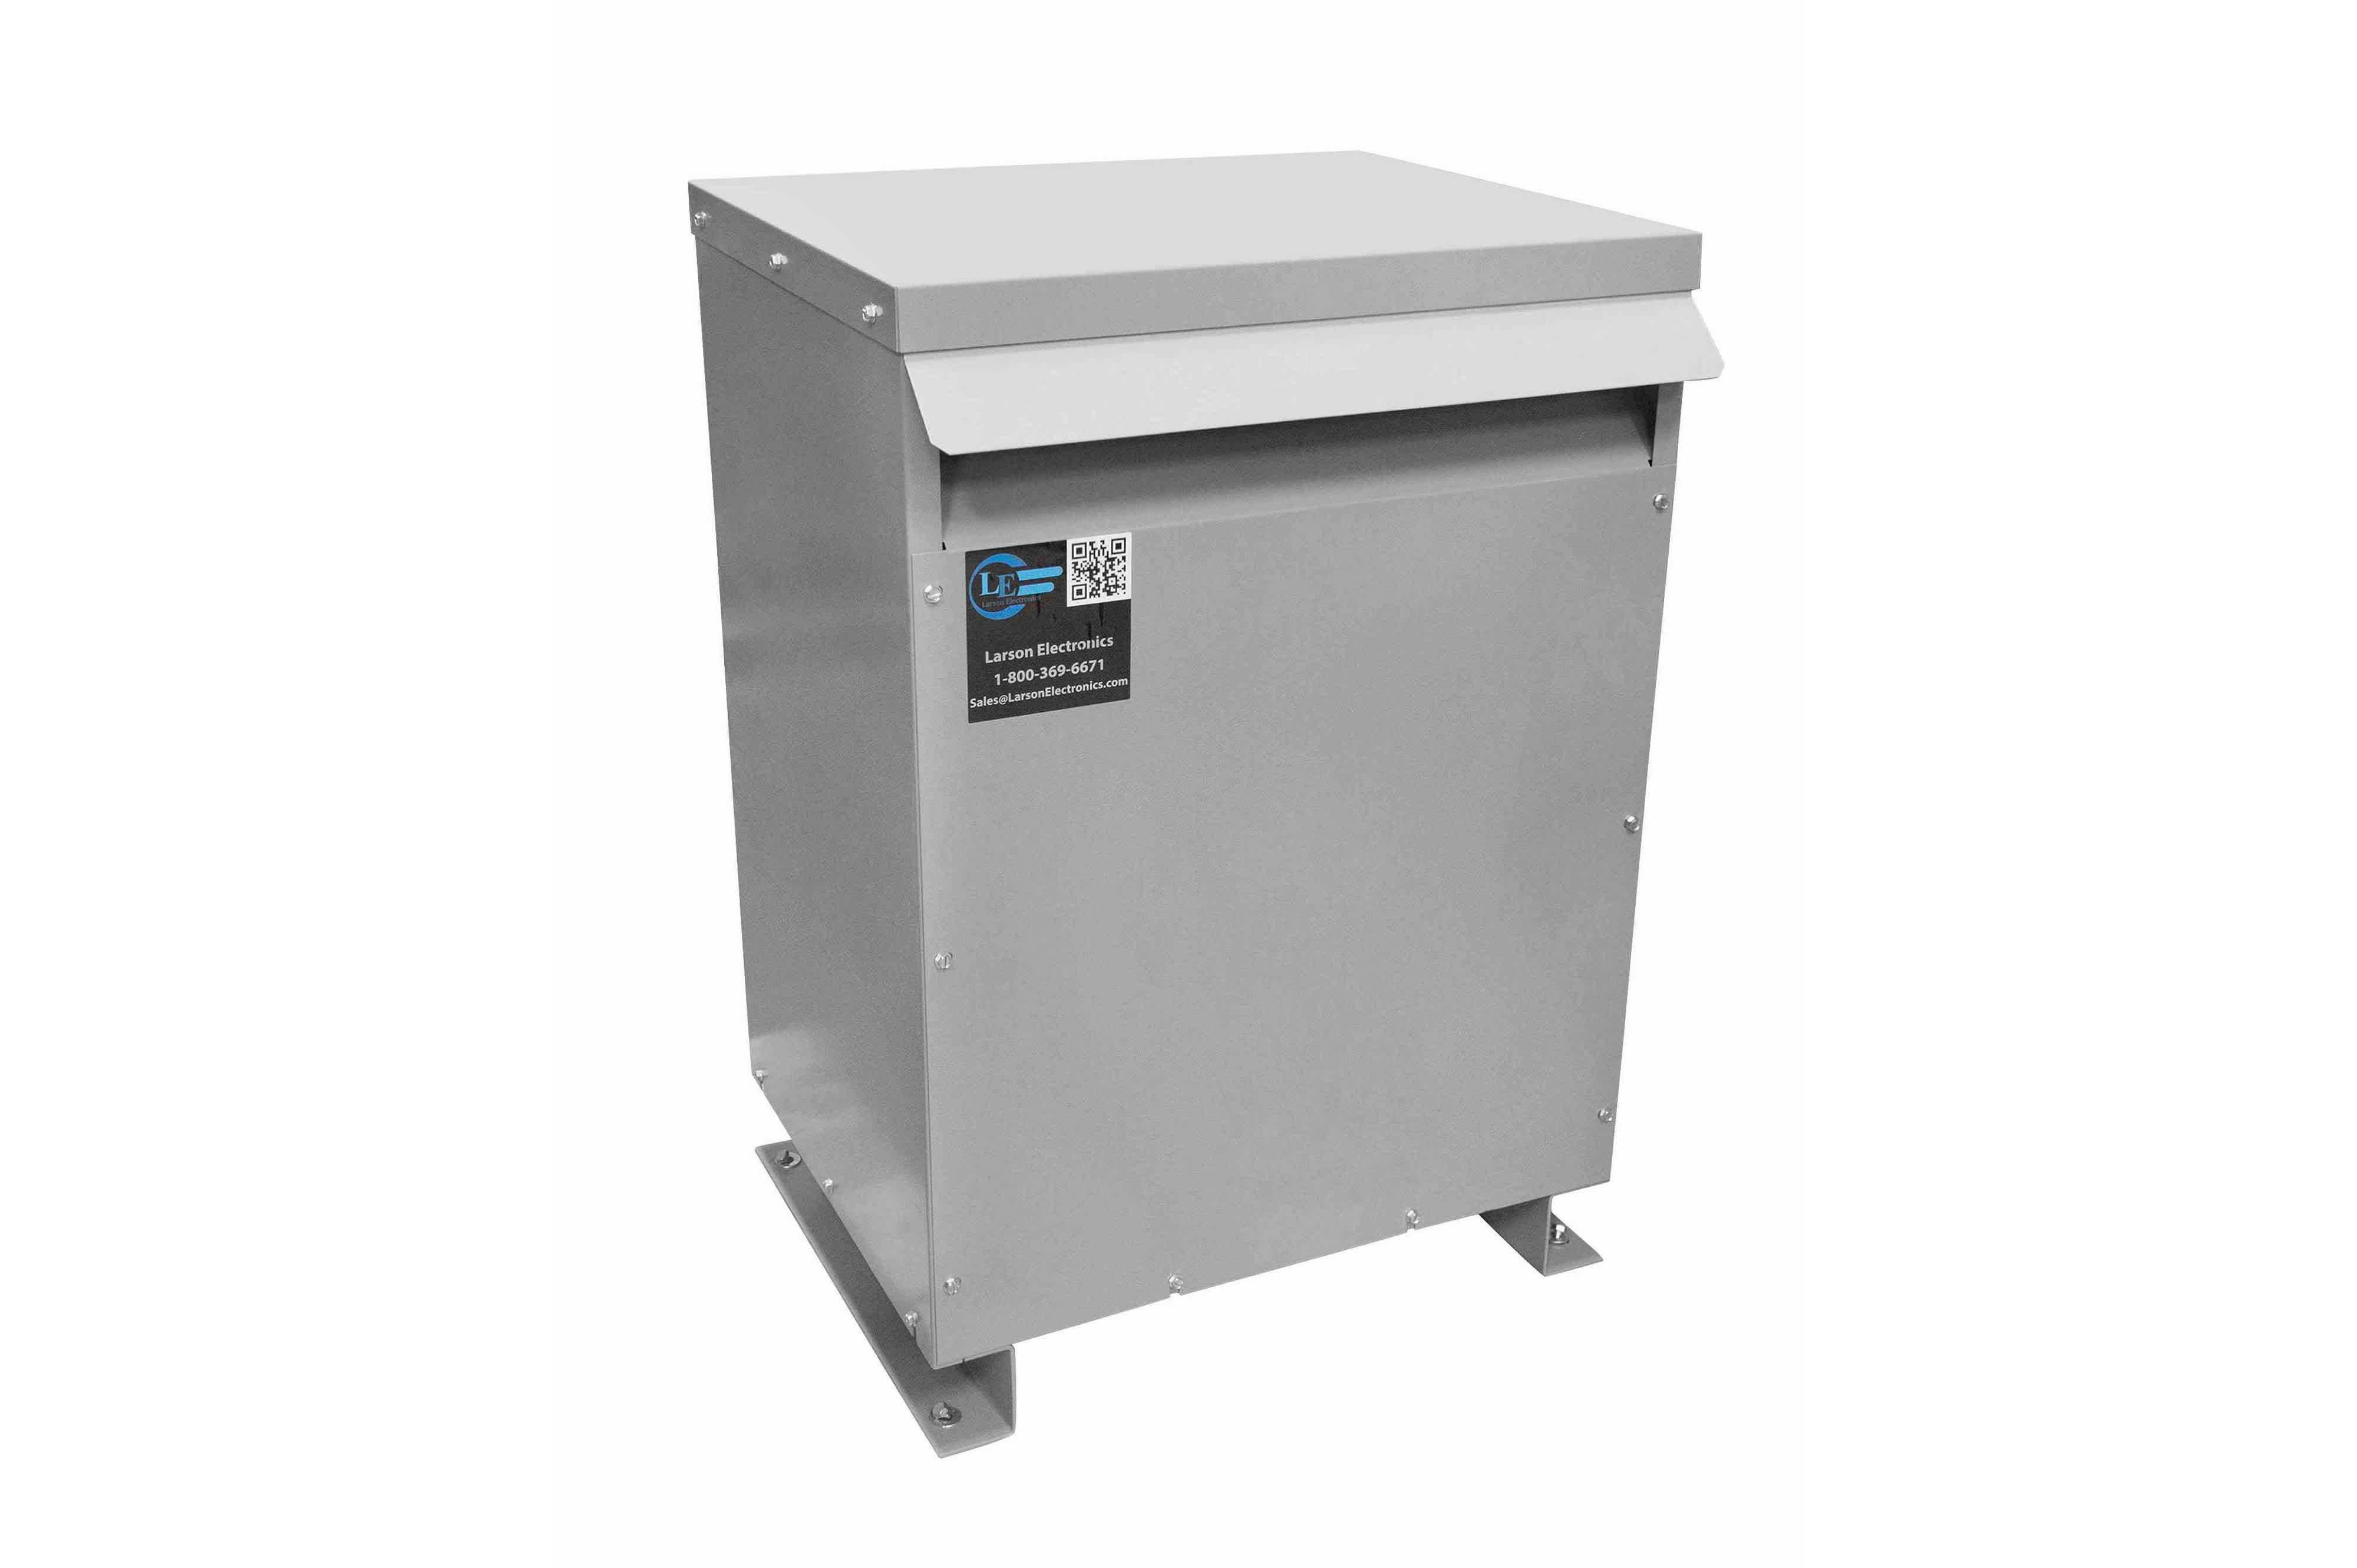 35 kVA 3PH Isolation Transformer, 600V Wye Primary, 208V Delta Secondary, N3R, Ventilated, 60 Hz